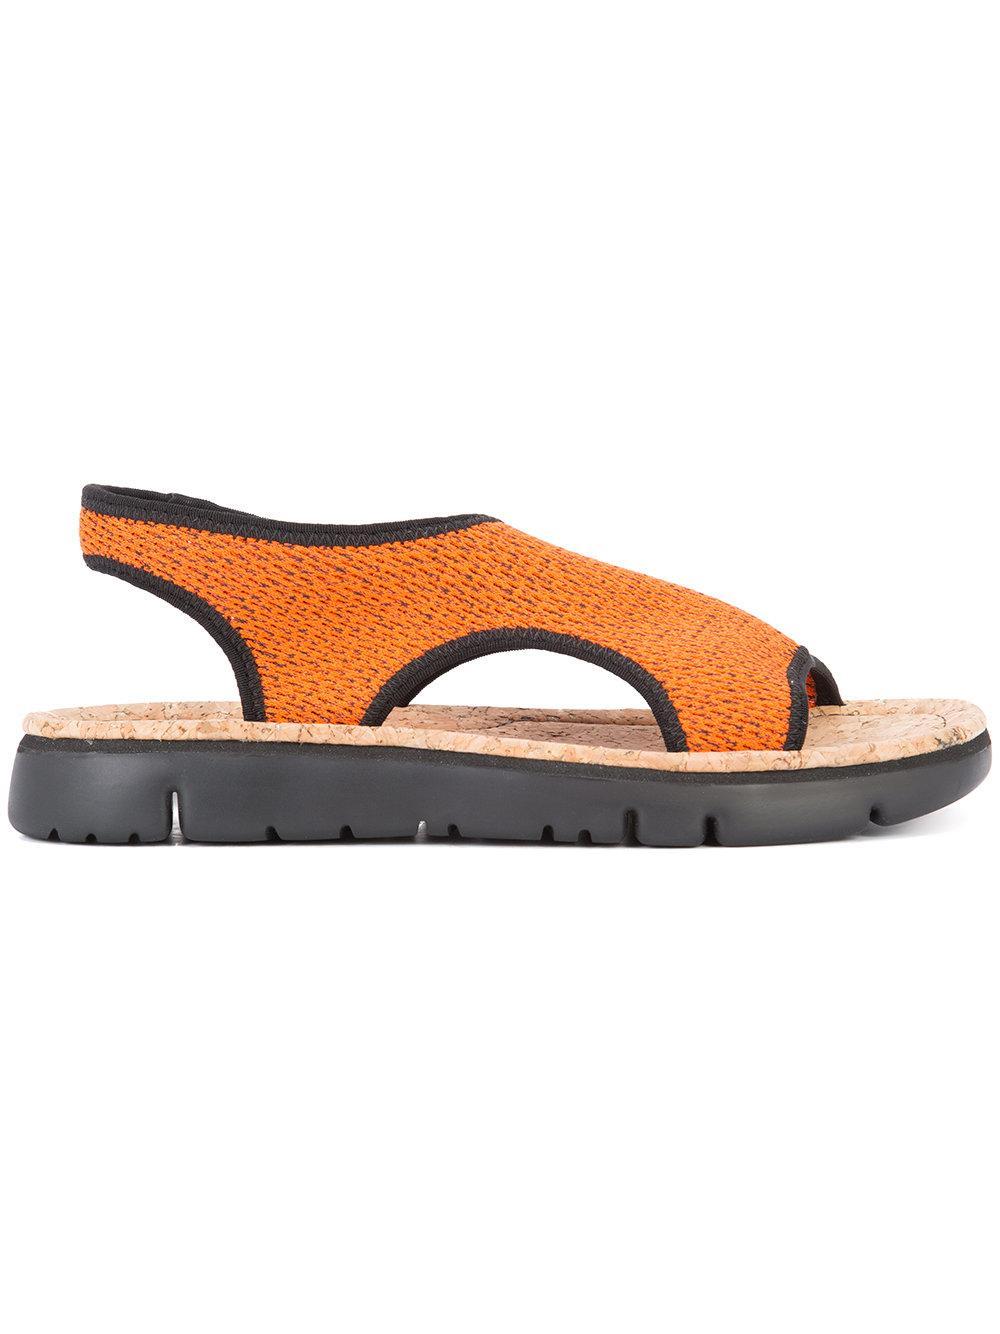 Lyst Camper Slingback Sandals In Orange